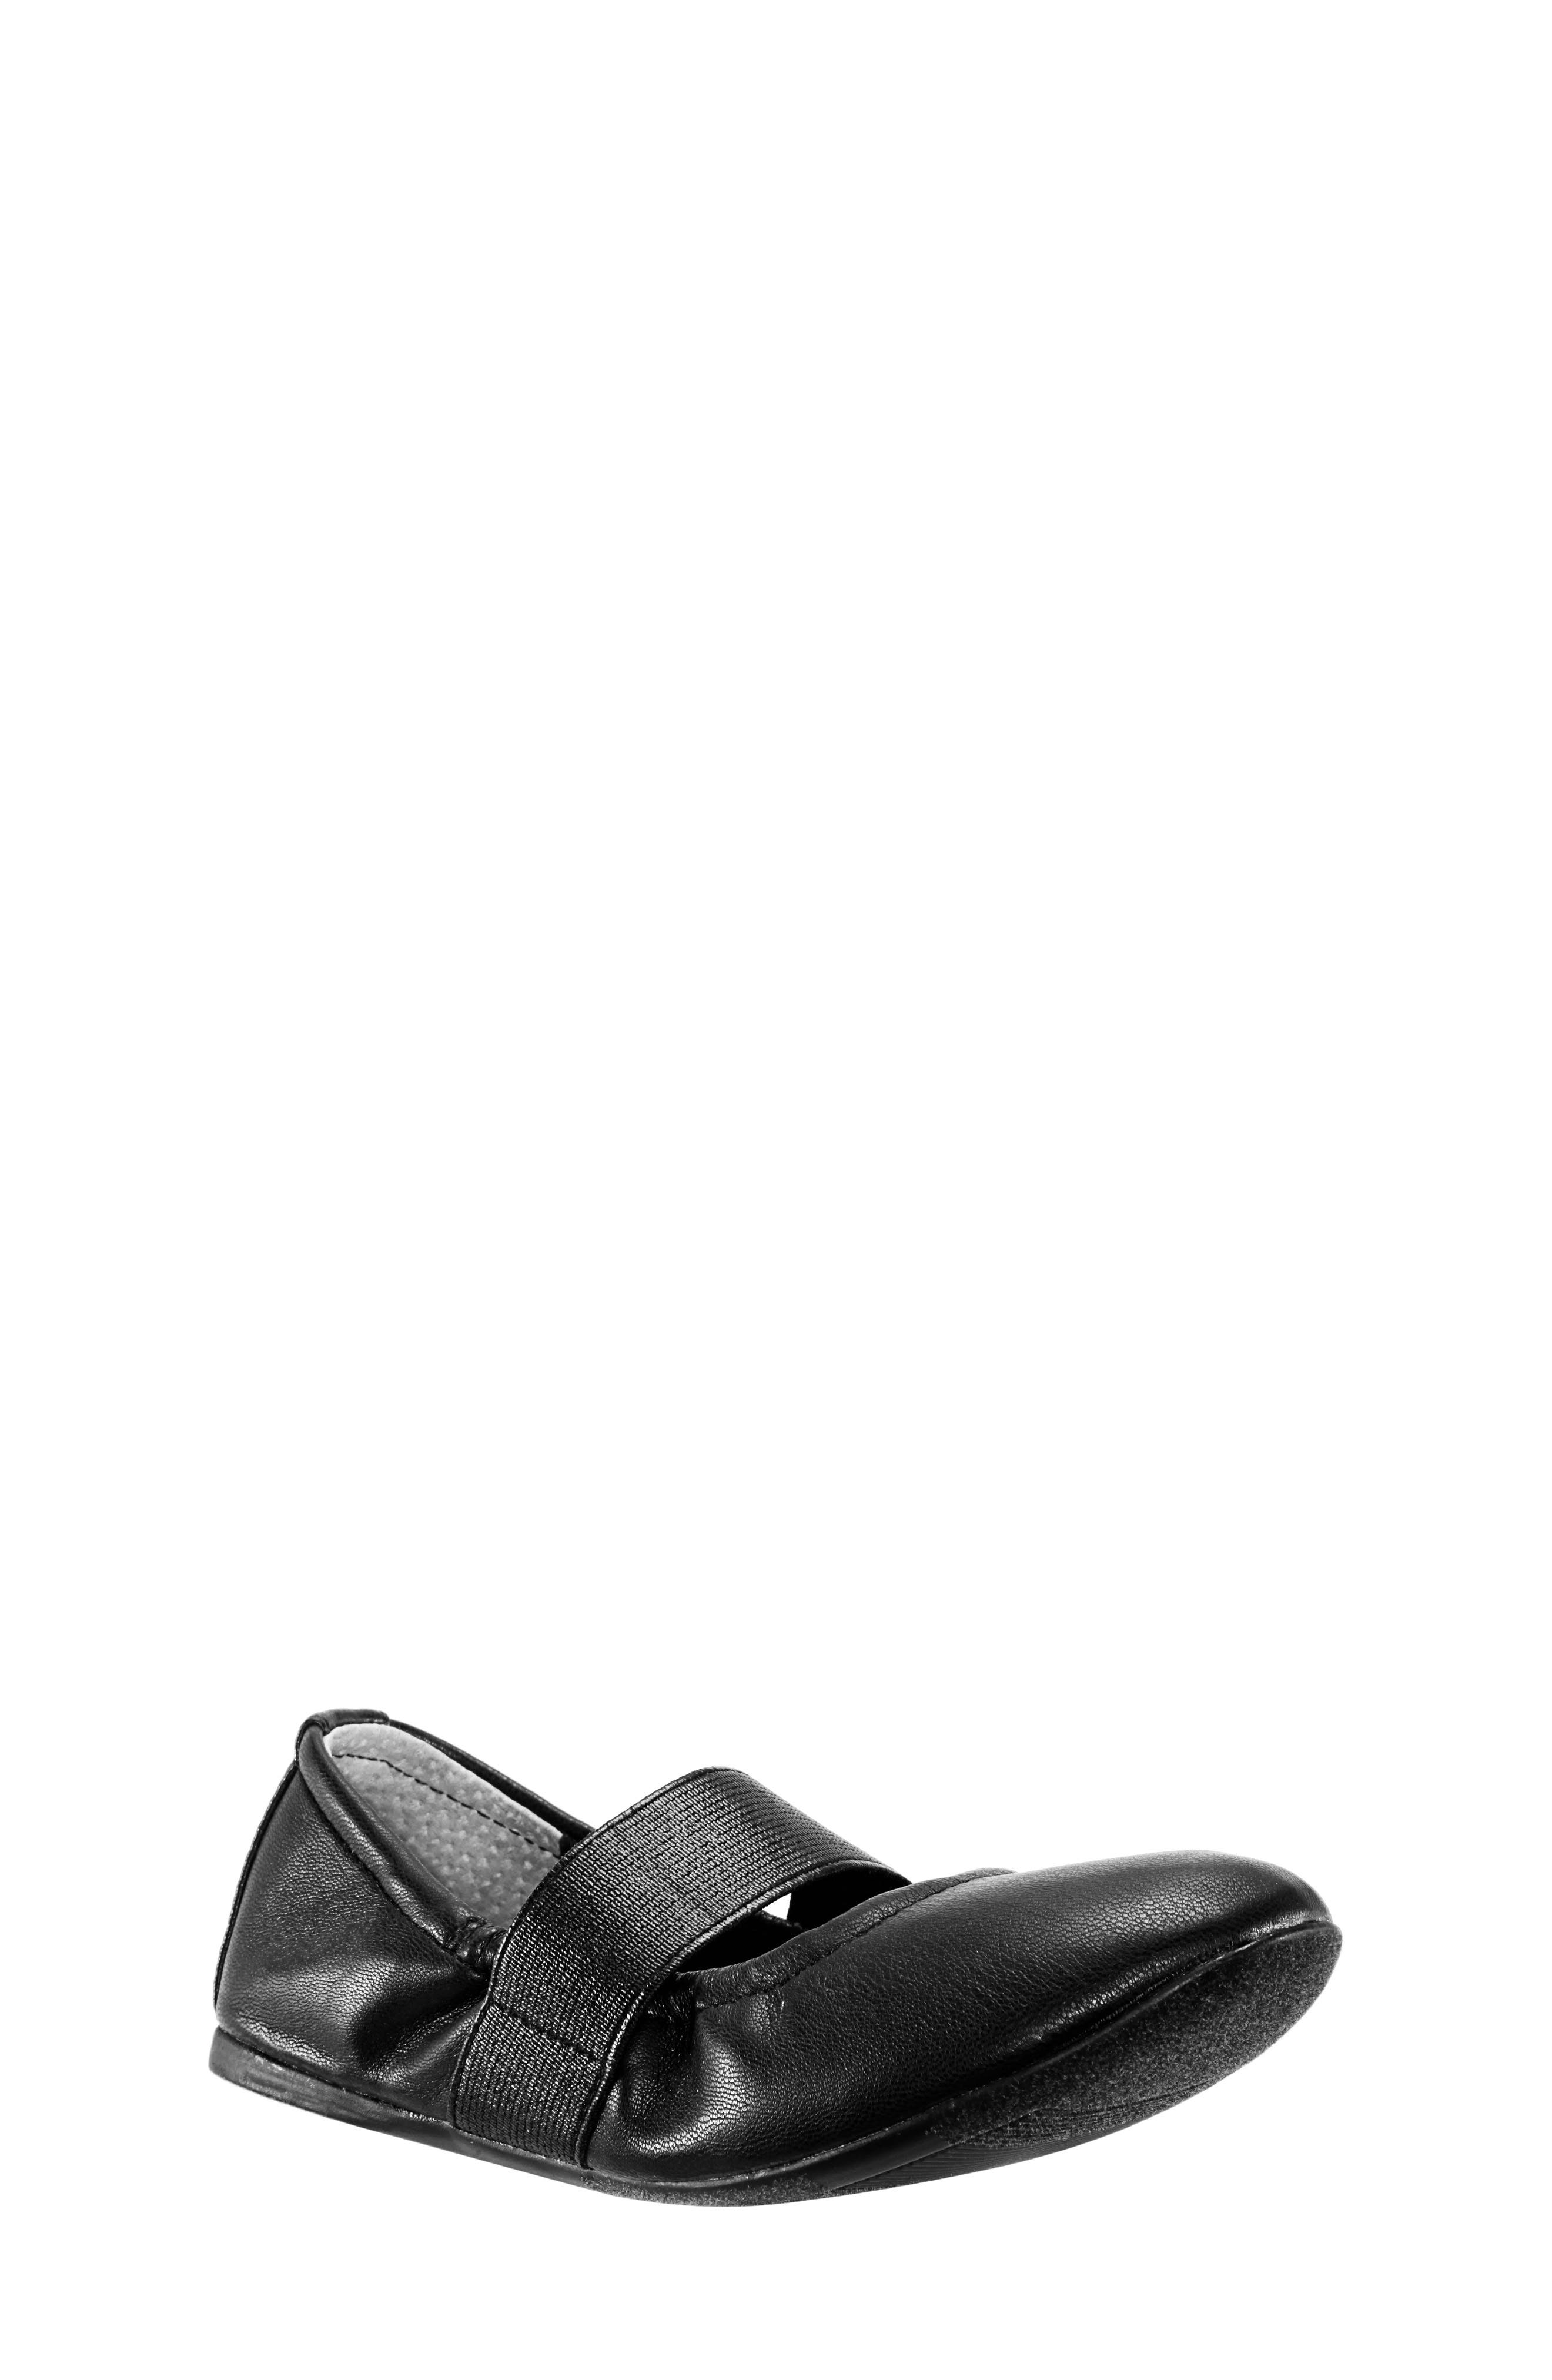 Aylee Ballet Flat,                         Main,                         color, BLACK SMOOTH